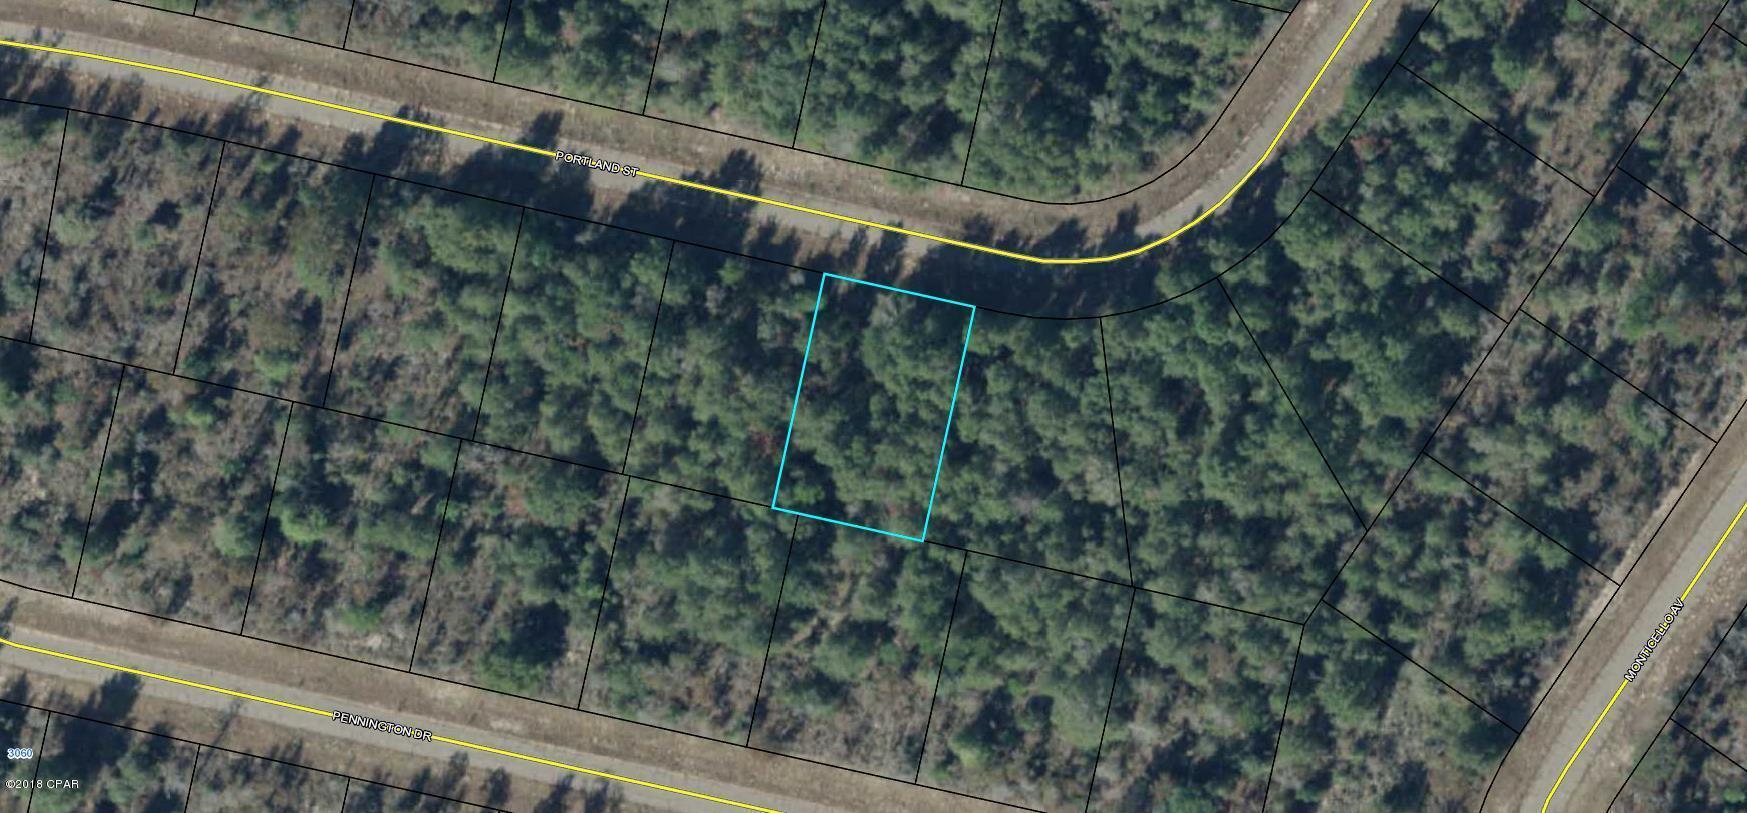 Photo of 0.229 Acre Portland Street Chipley FL 32428